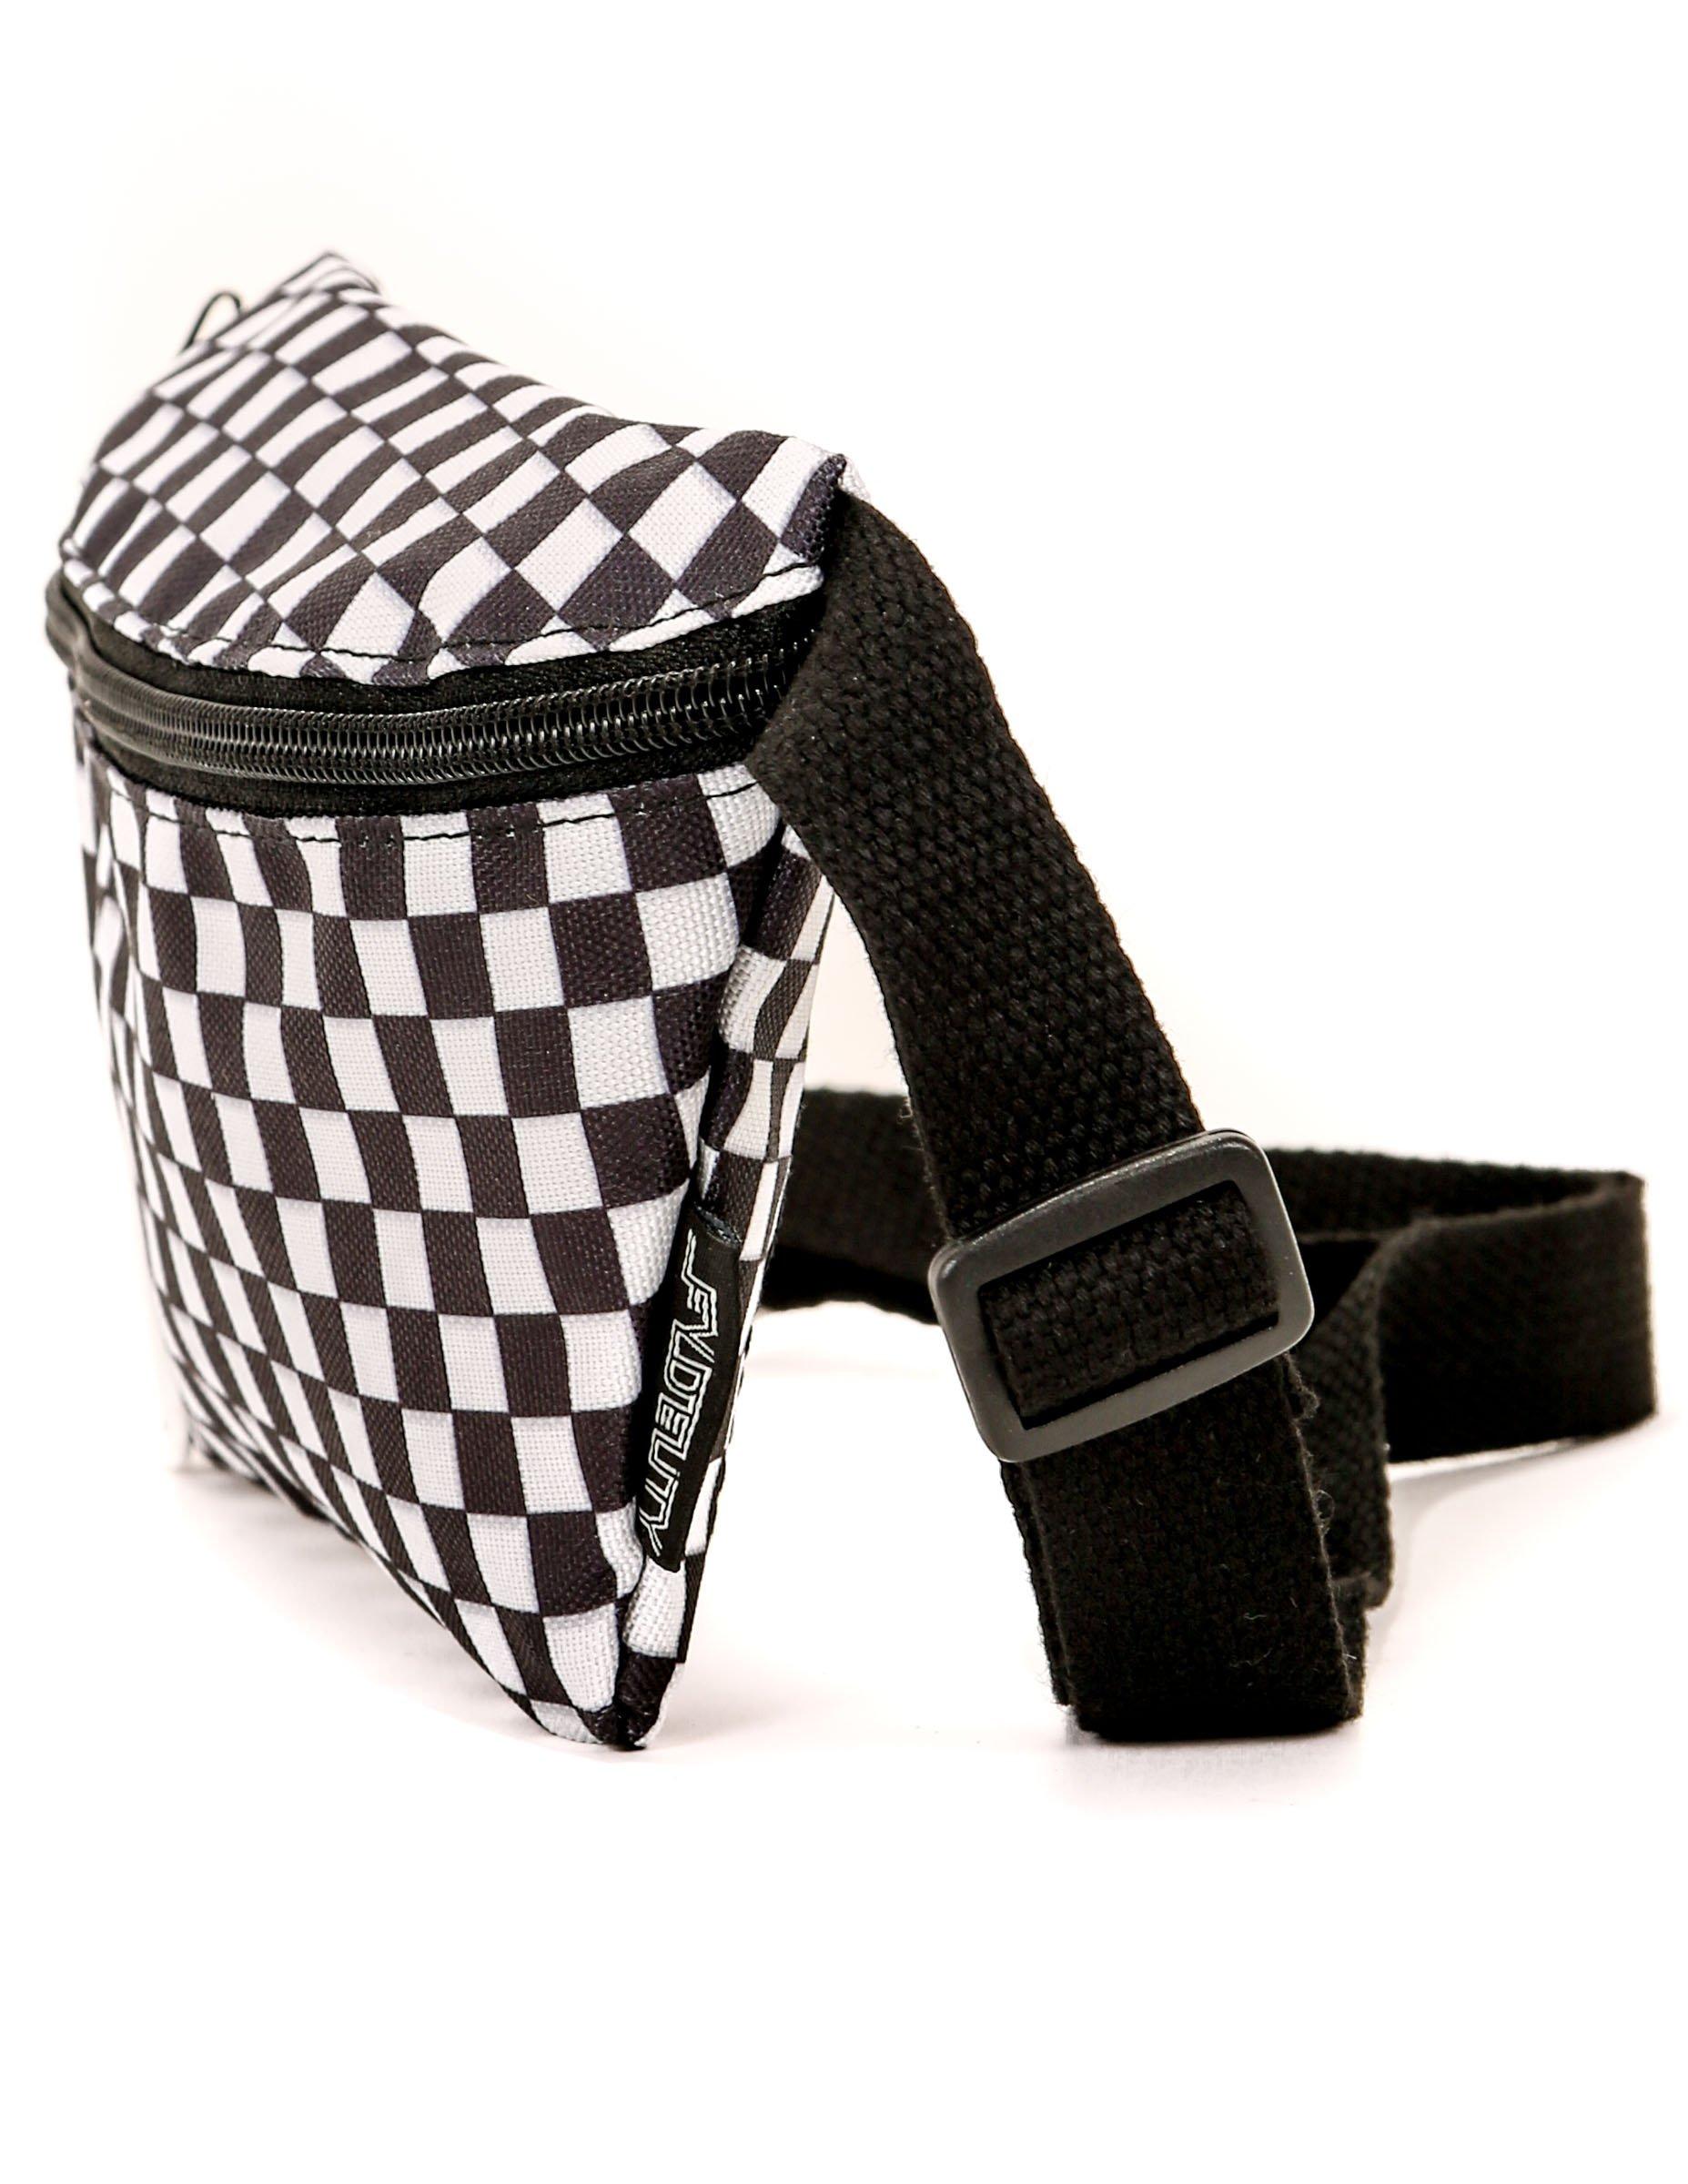 FYDELITY- Ultra-Slim Fanny Pack: PRINT Indy, Black & White Check